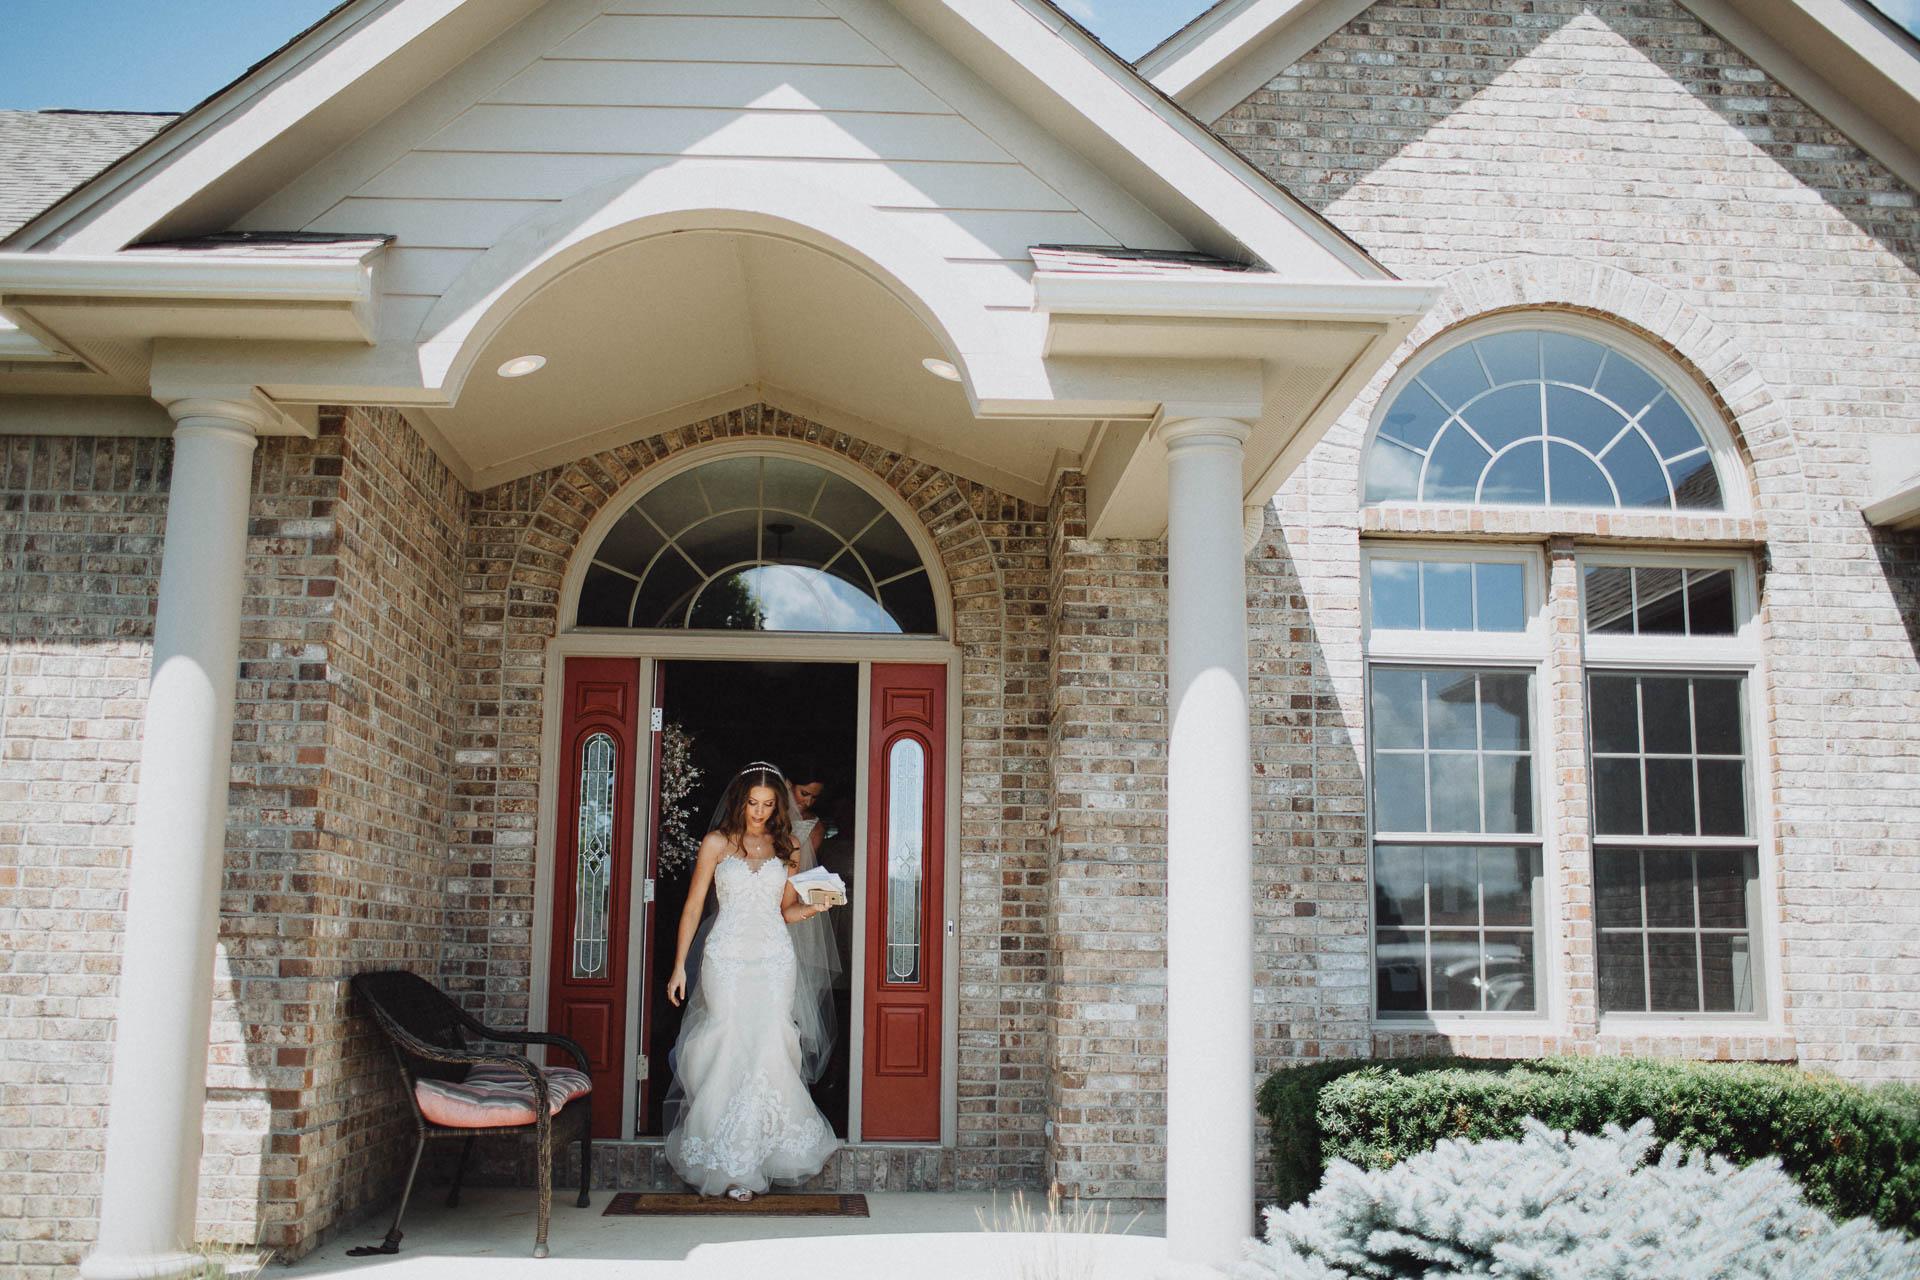 Keri-Joseph-Downtown-Dayton-Wedding-TopoftheMarket-018@2x.jpg